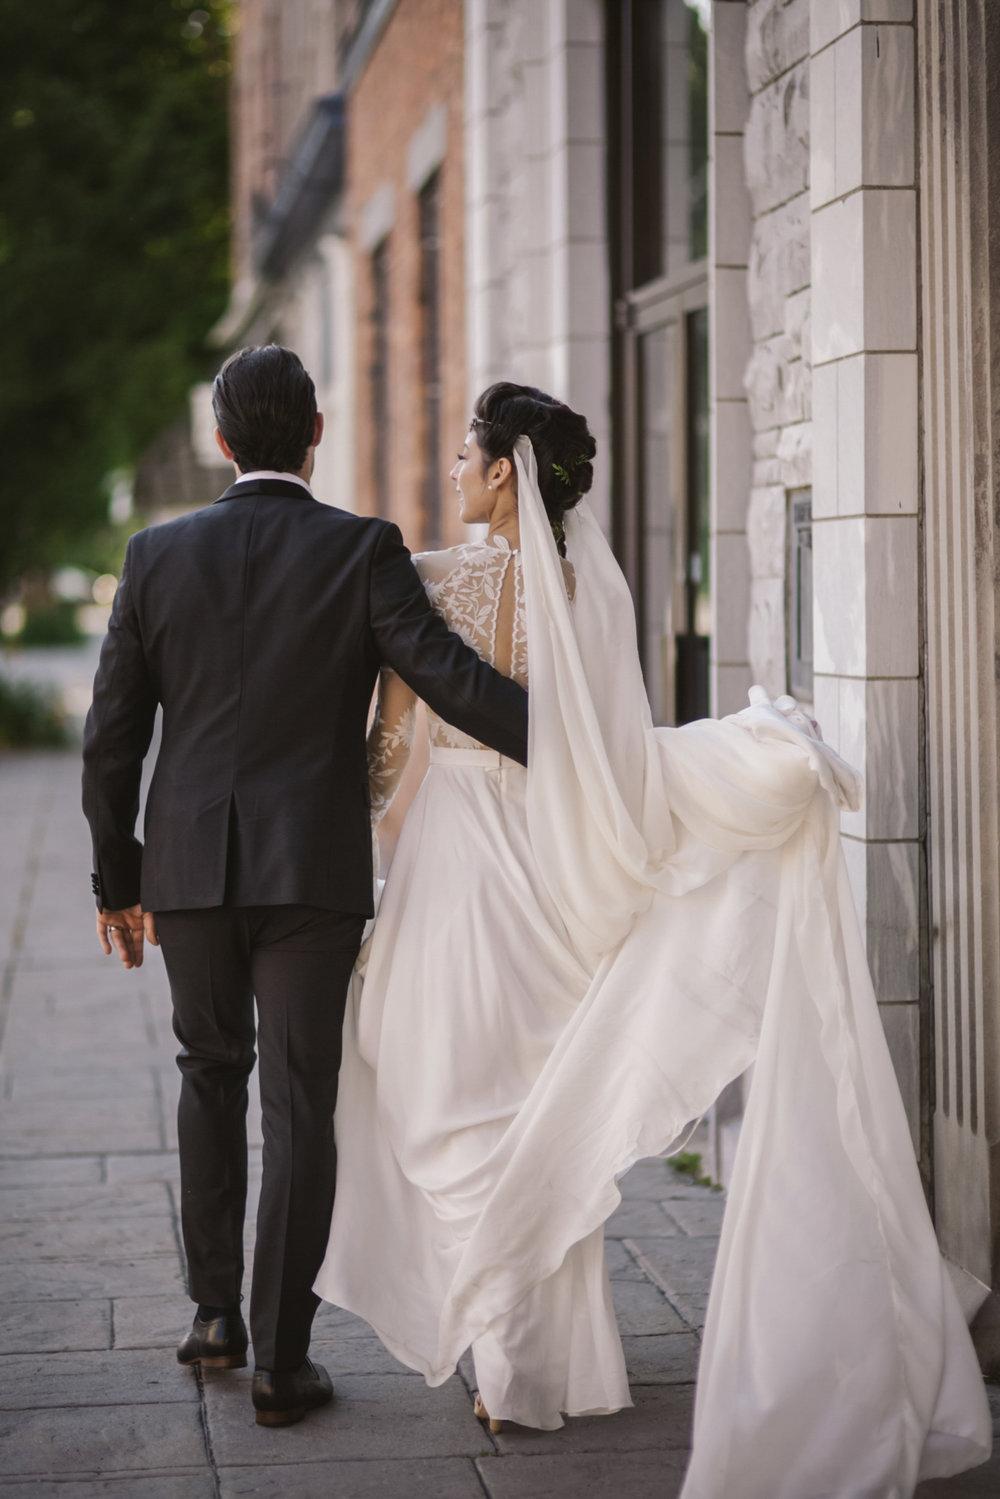 Kimberly-Coccagnia-Wedding-Photographer-163.JPG